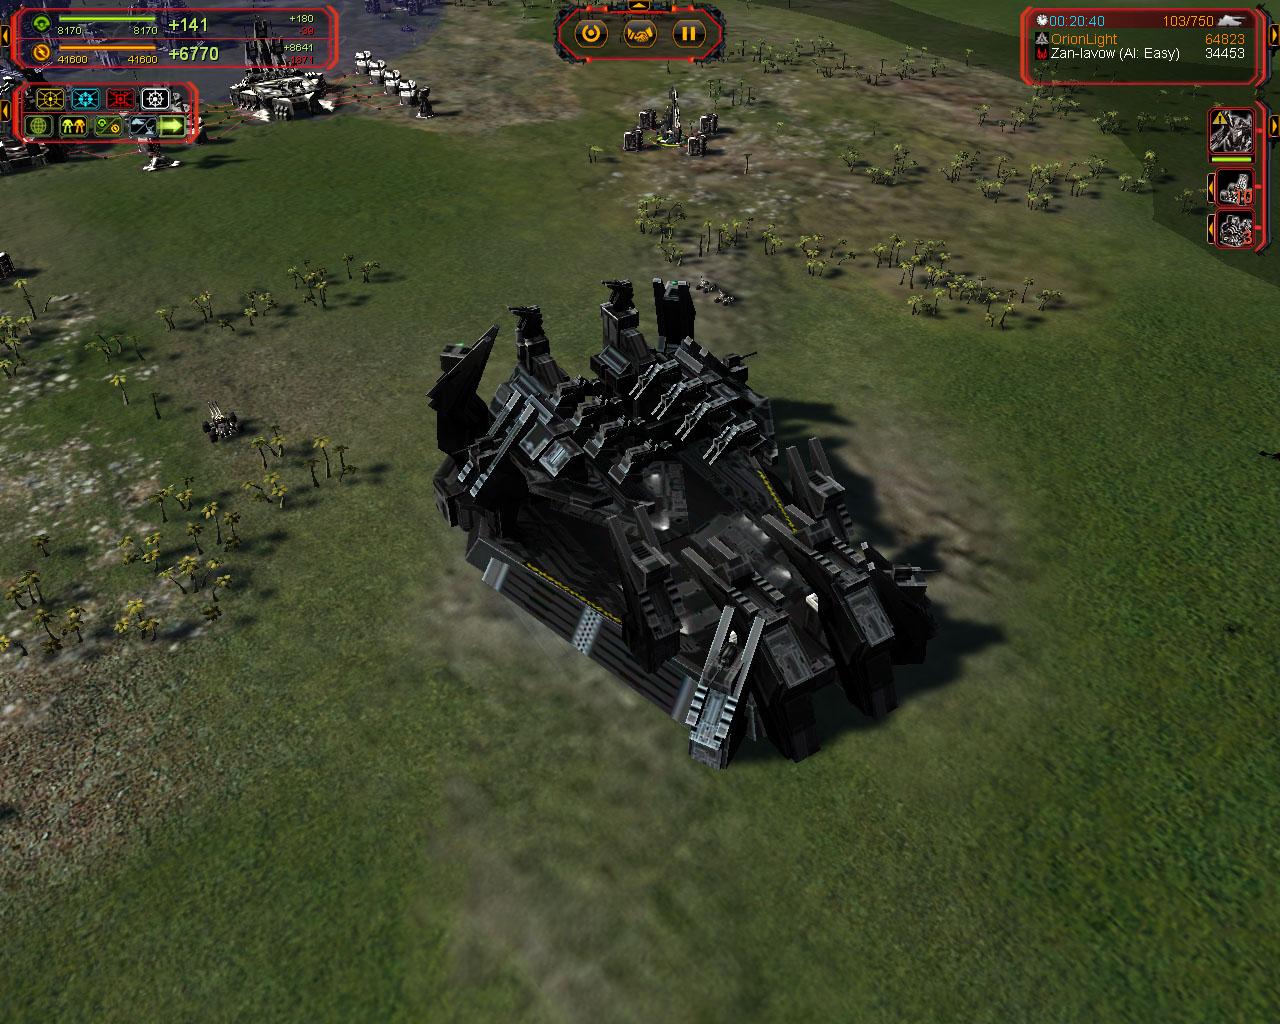 https://supreme-commander.ru/upload/mob_factory.jpg